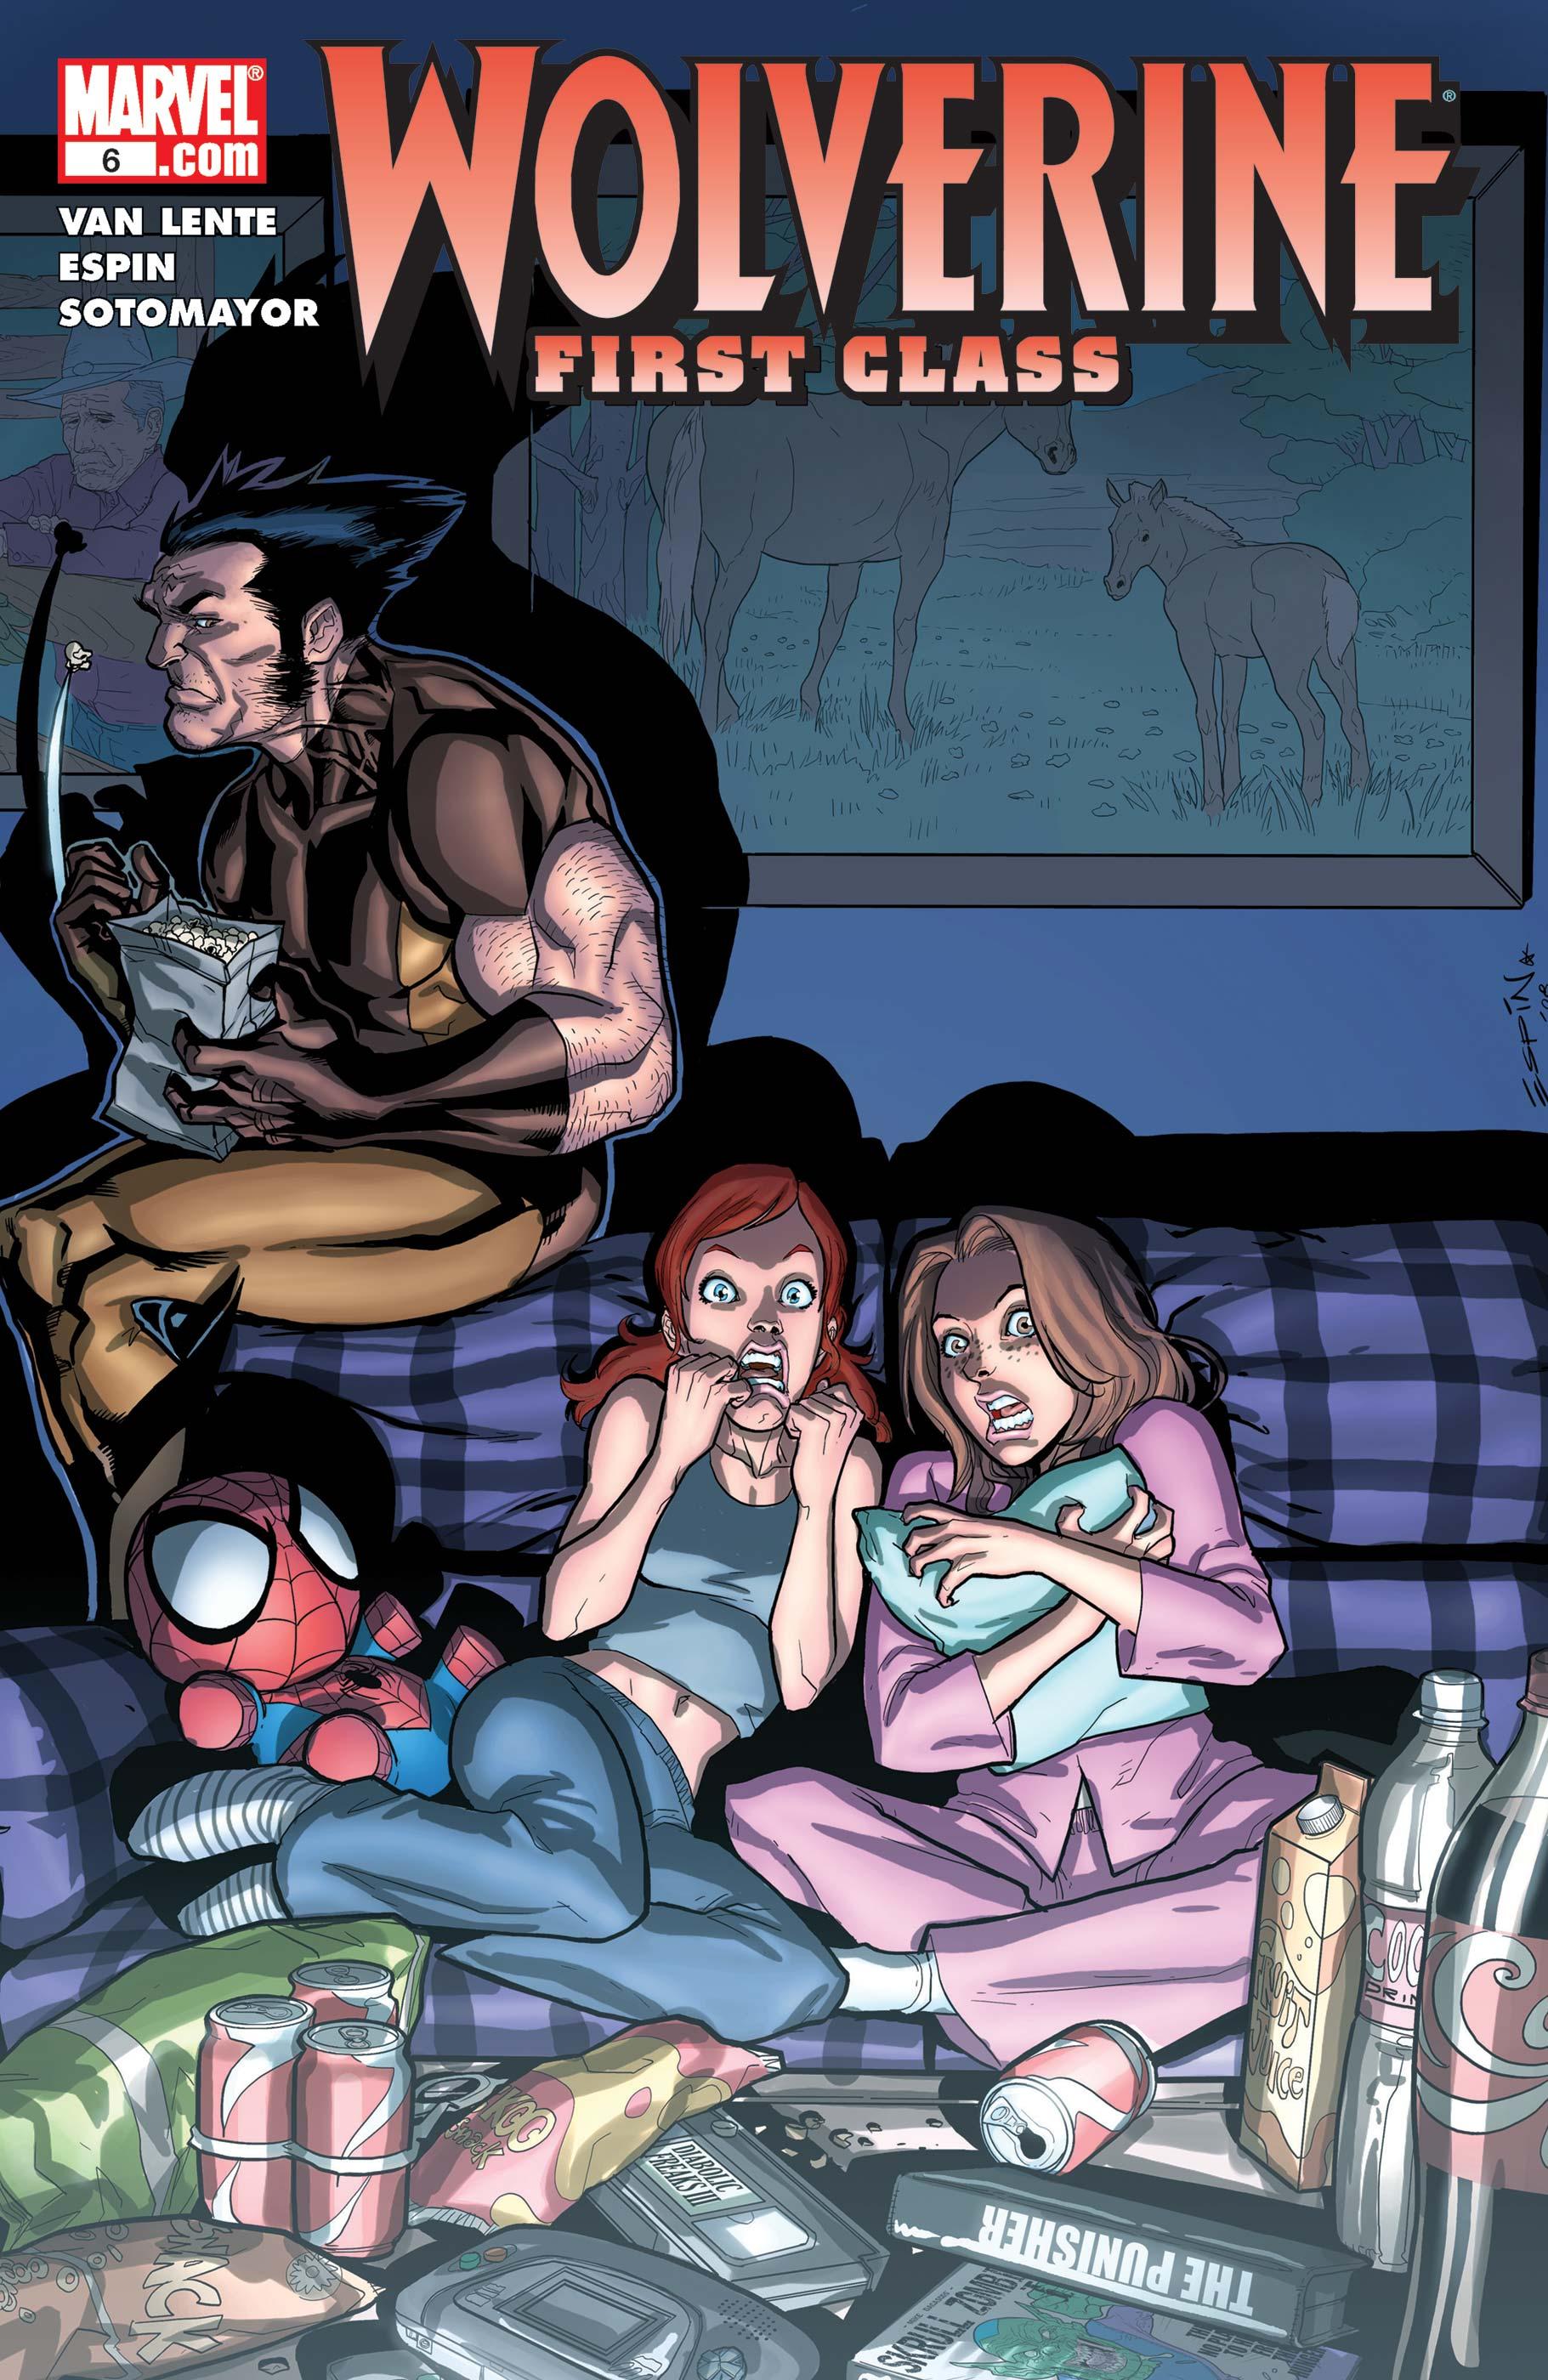 Wolverine: First Class (2008) #6